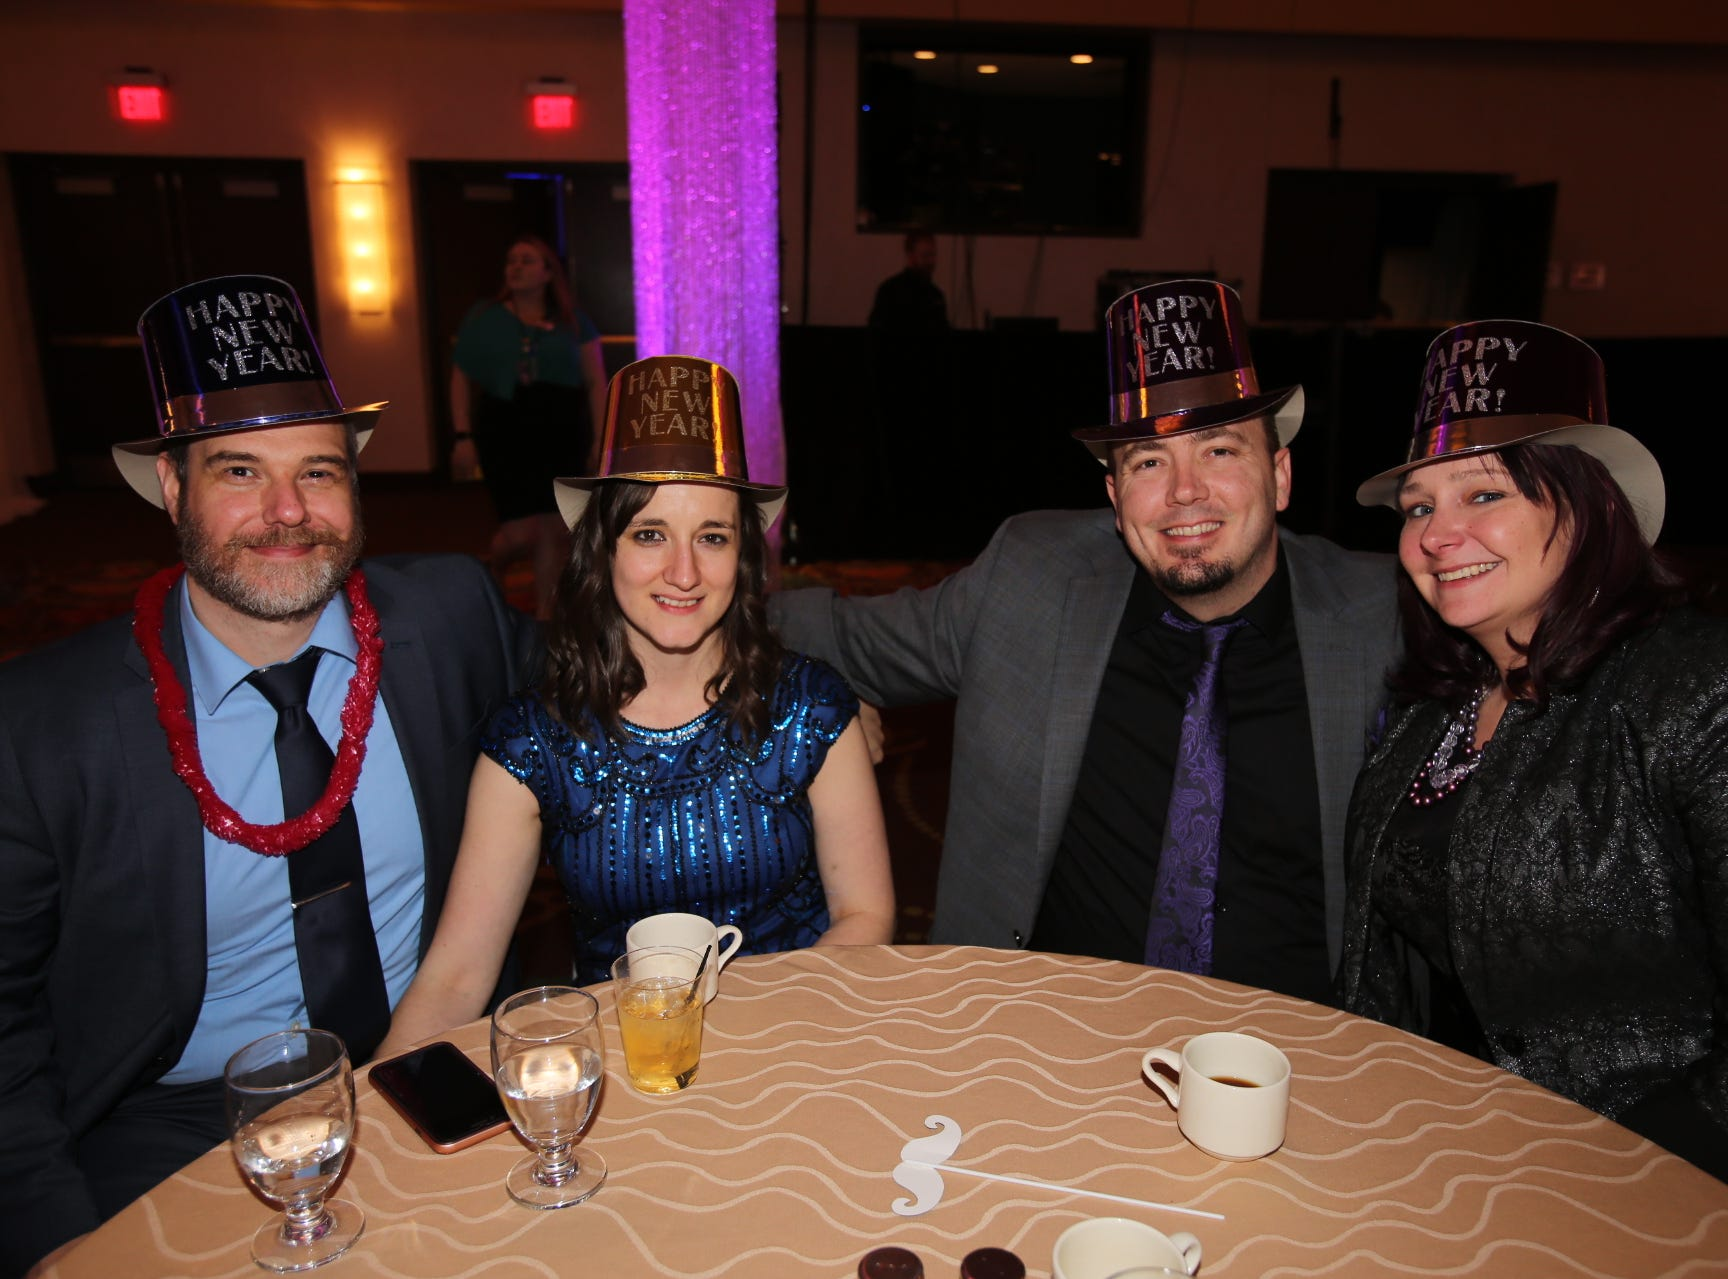 Matthew Doden, Ida Phillips, Dustin and Liz Smith